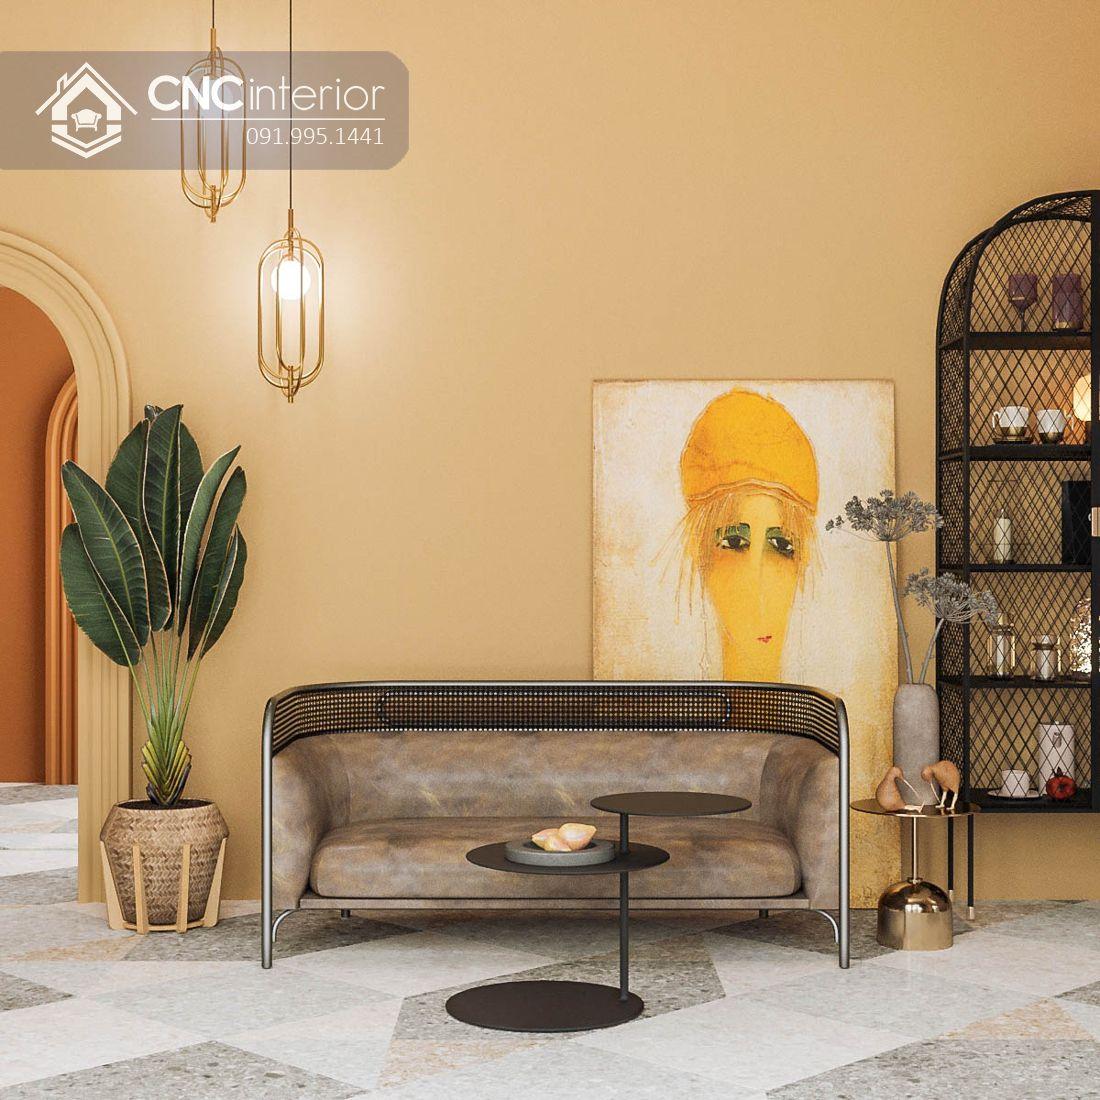 Spa Romans Hội An phong cách Art Deco Veranda